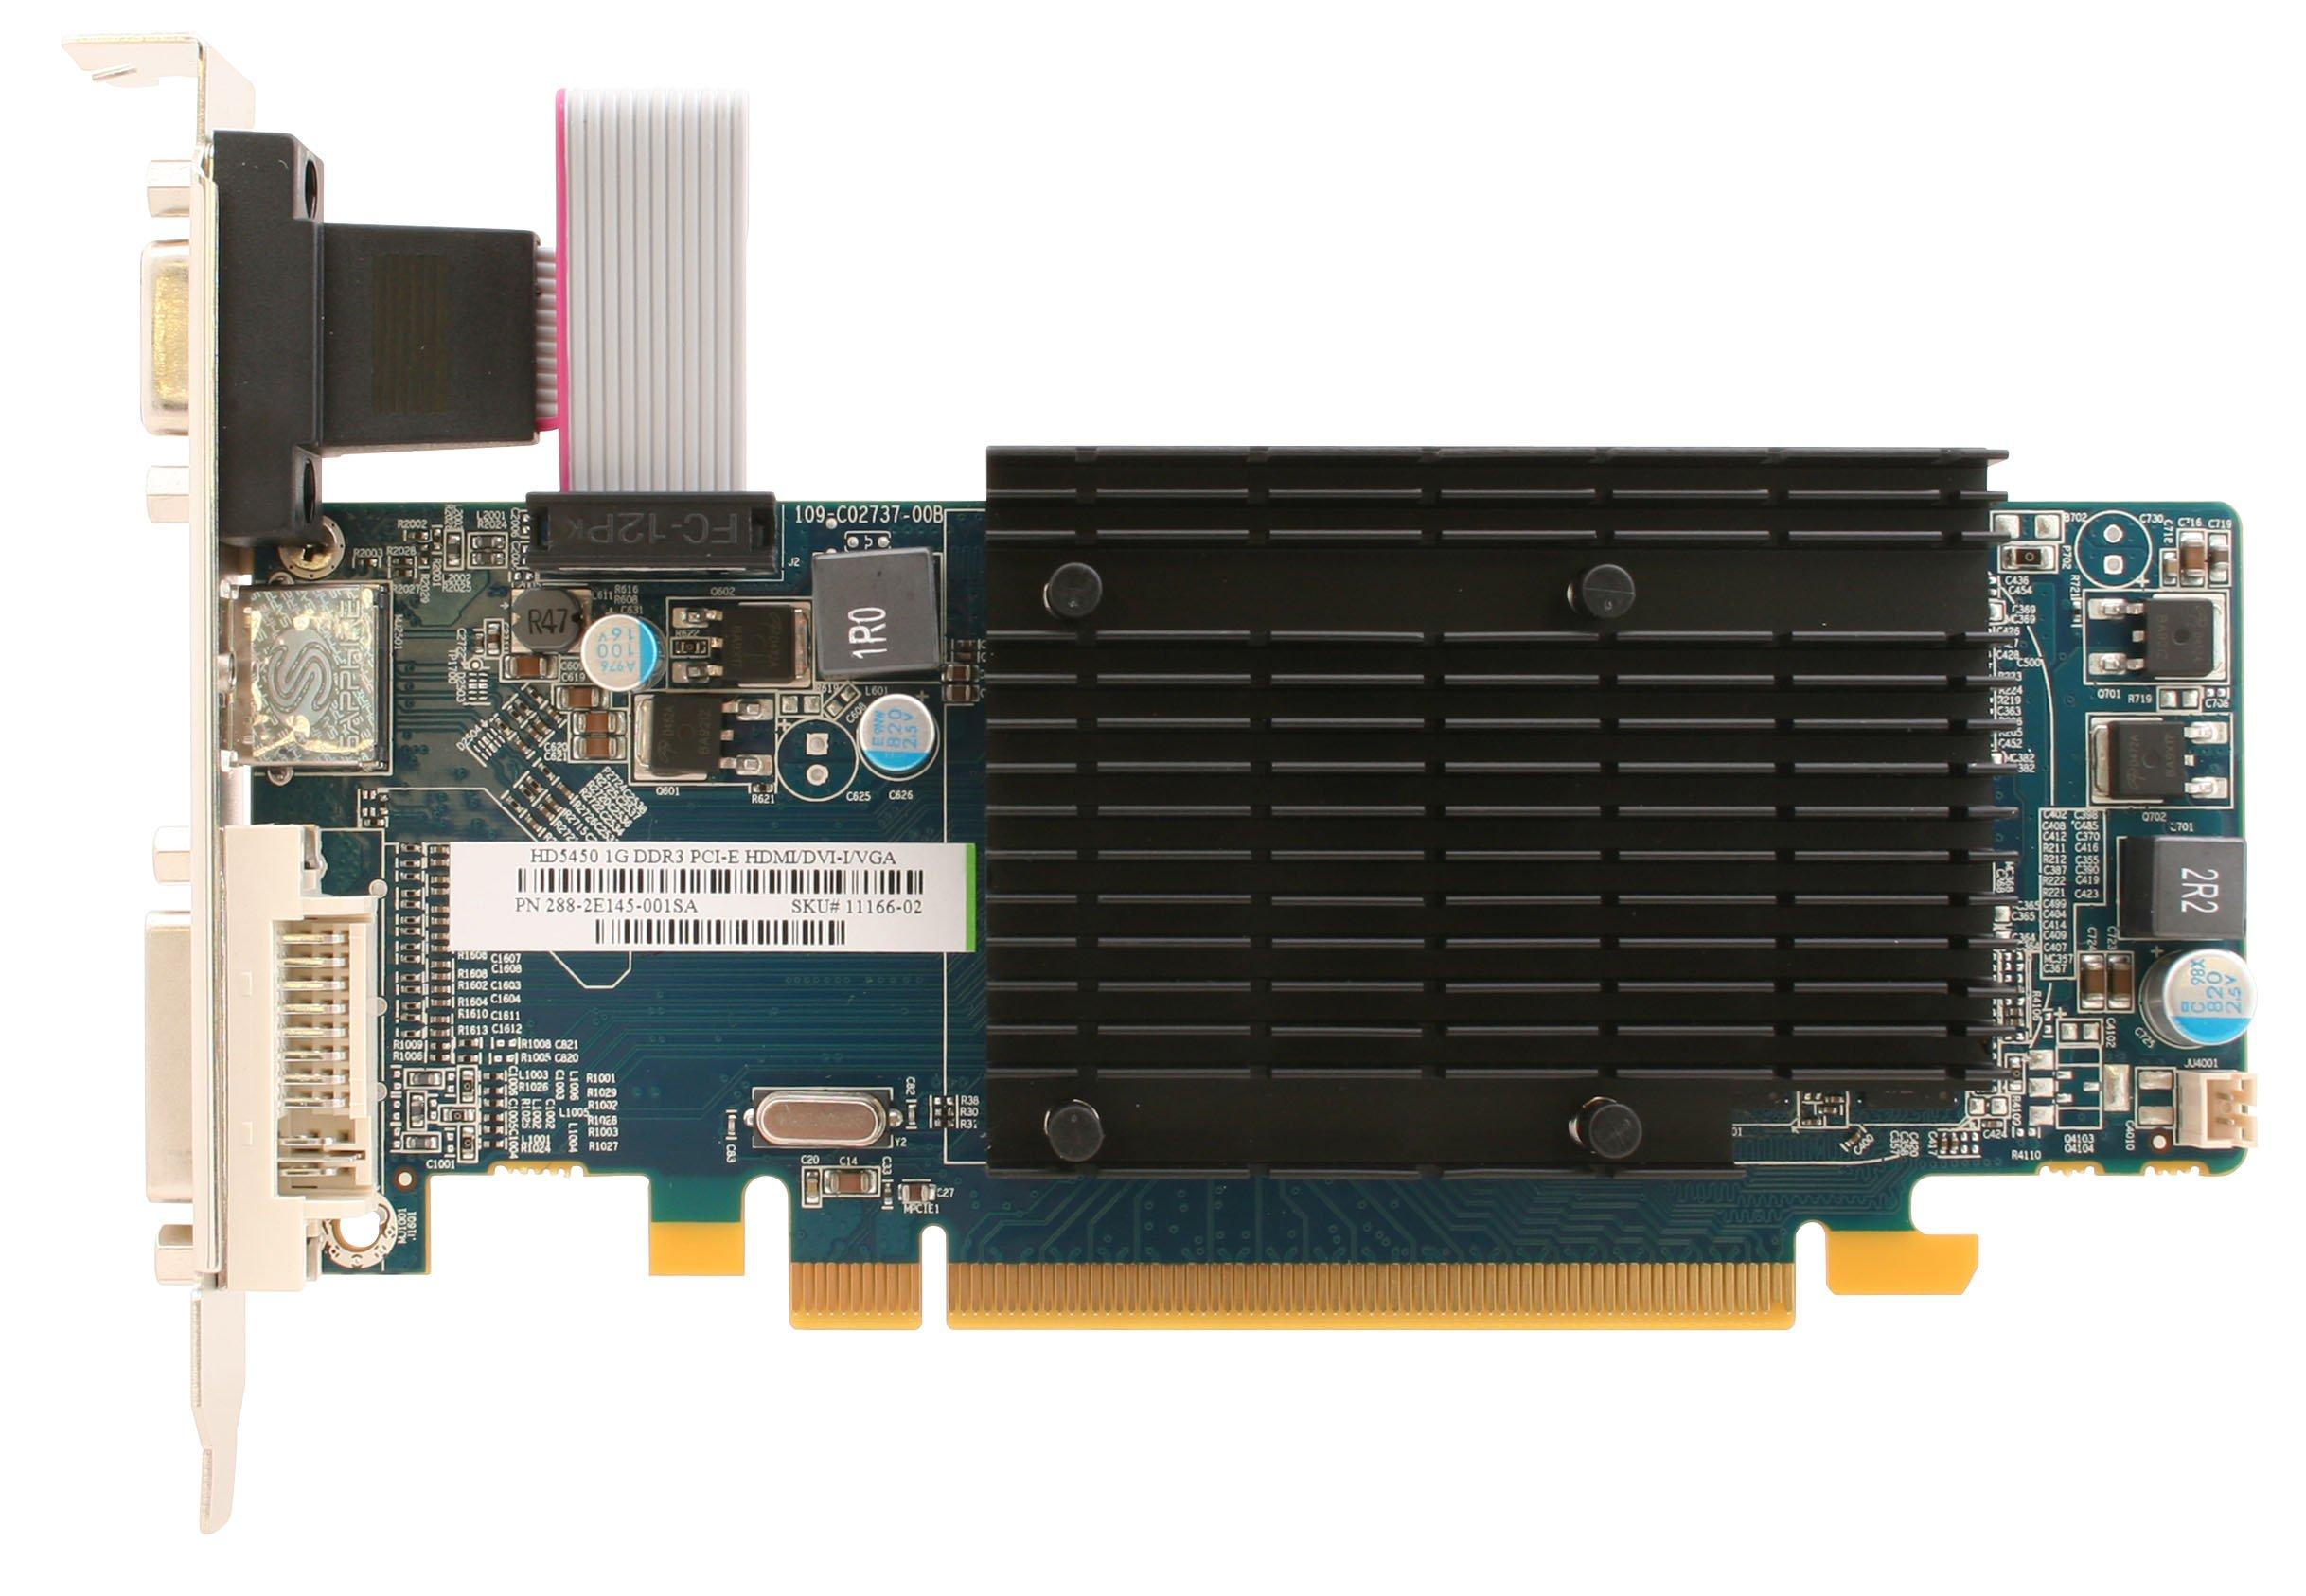 Sapphire Radeon HD 5450 1 GB DDR3 HDMI/DVI-D/VGA PCI-Express Graphics Card 100292DDR3L by Sapphire Technology (Image #1)